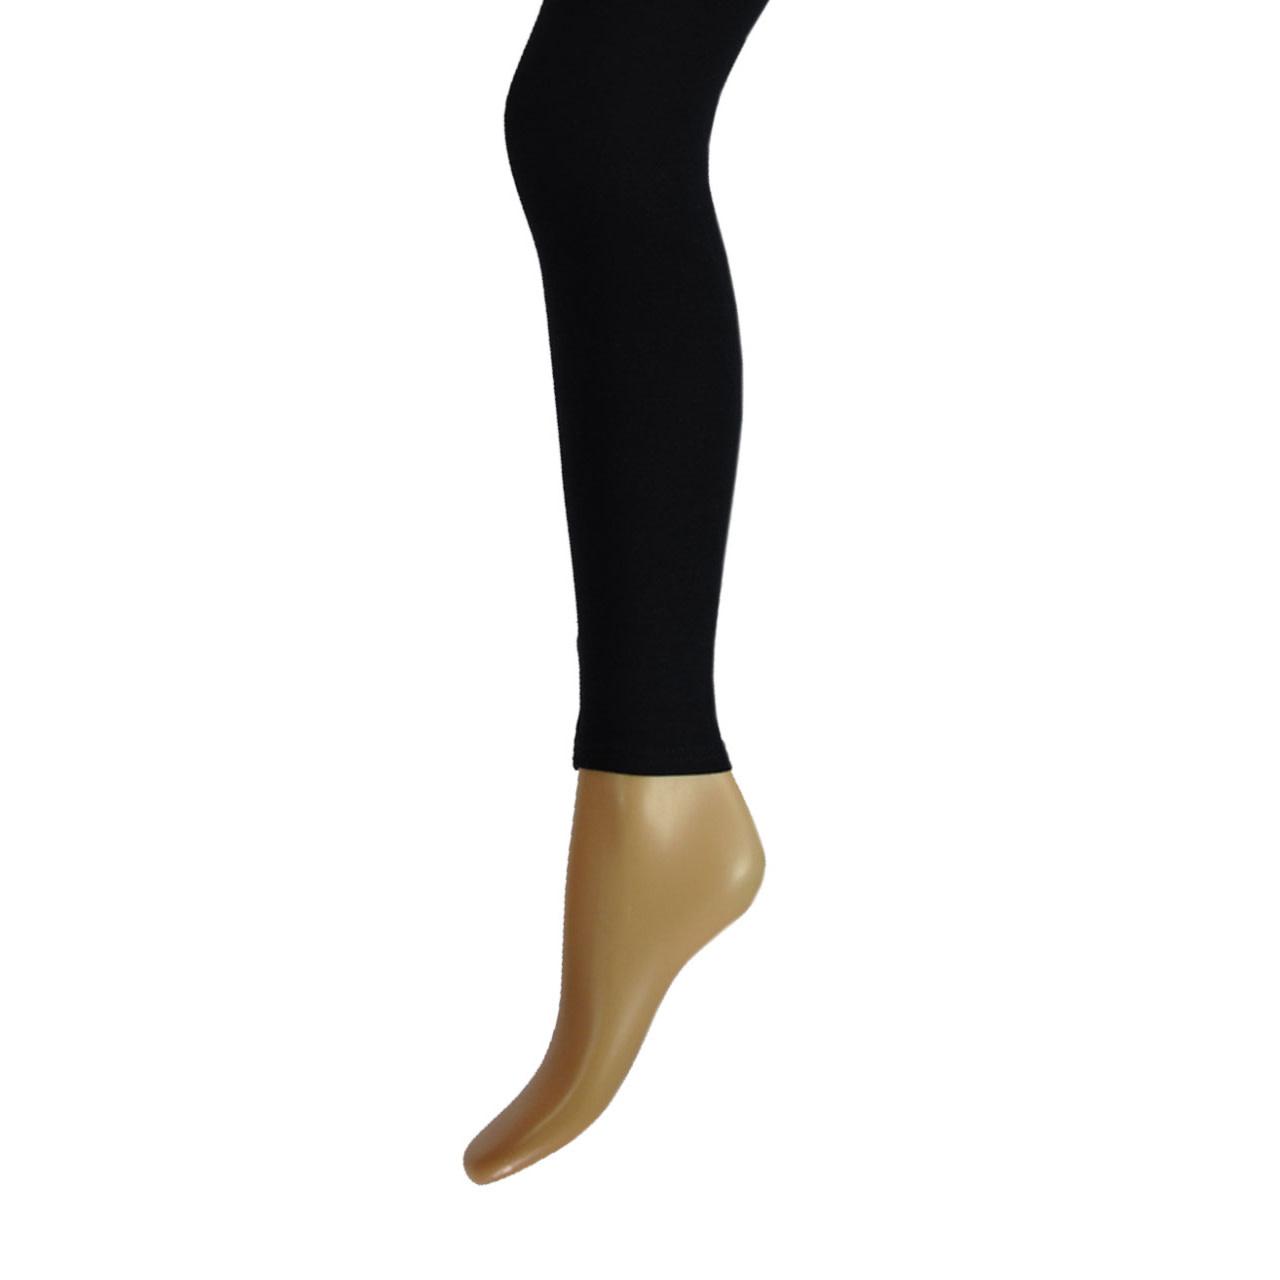 Marianne Dames legging Tricot 20150-1